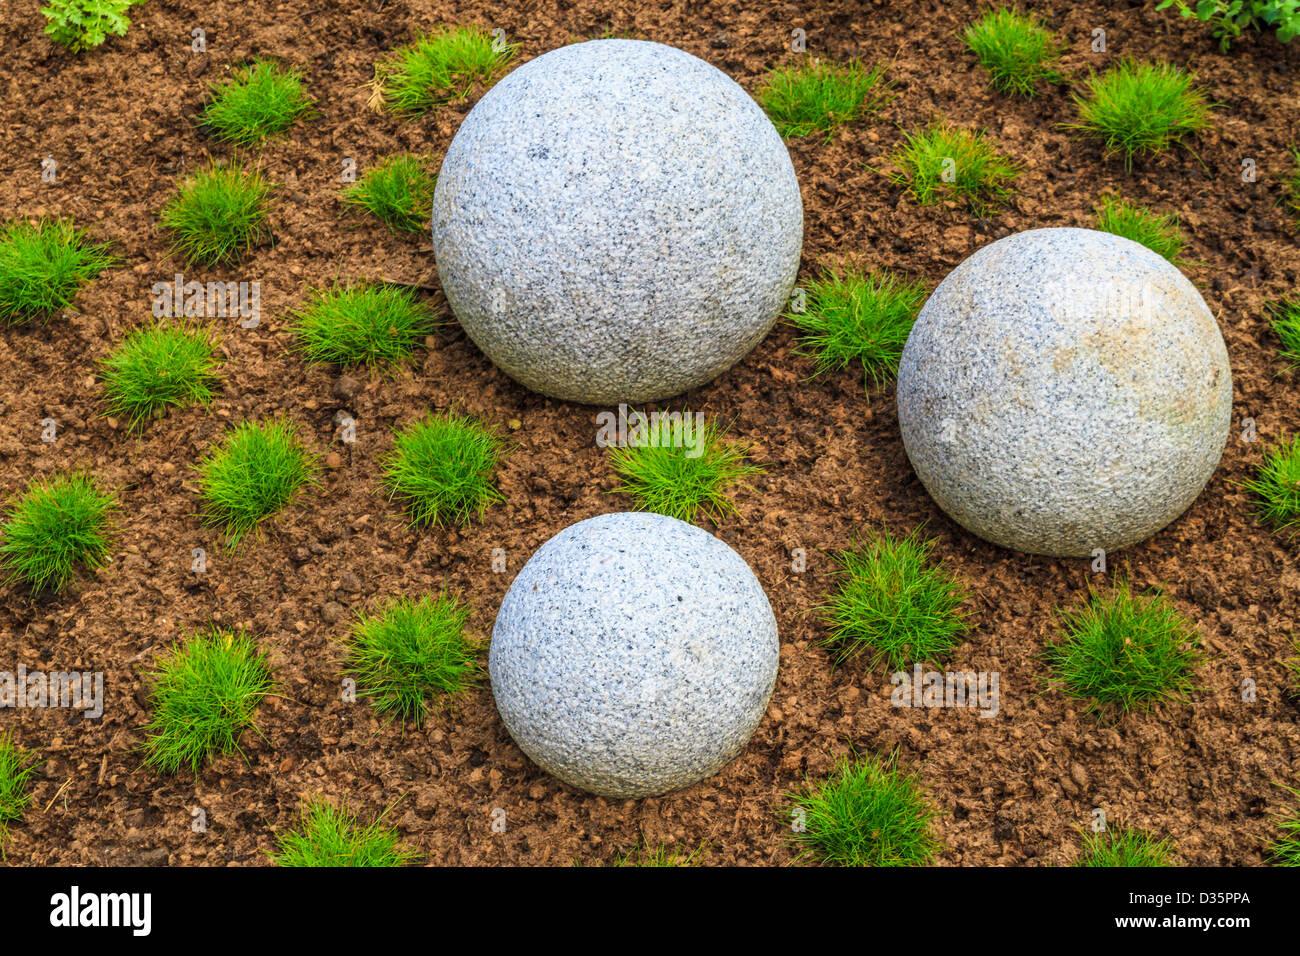 Japanese Zen Garden with granite stone boulders - Stock Image